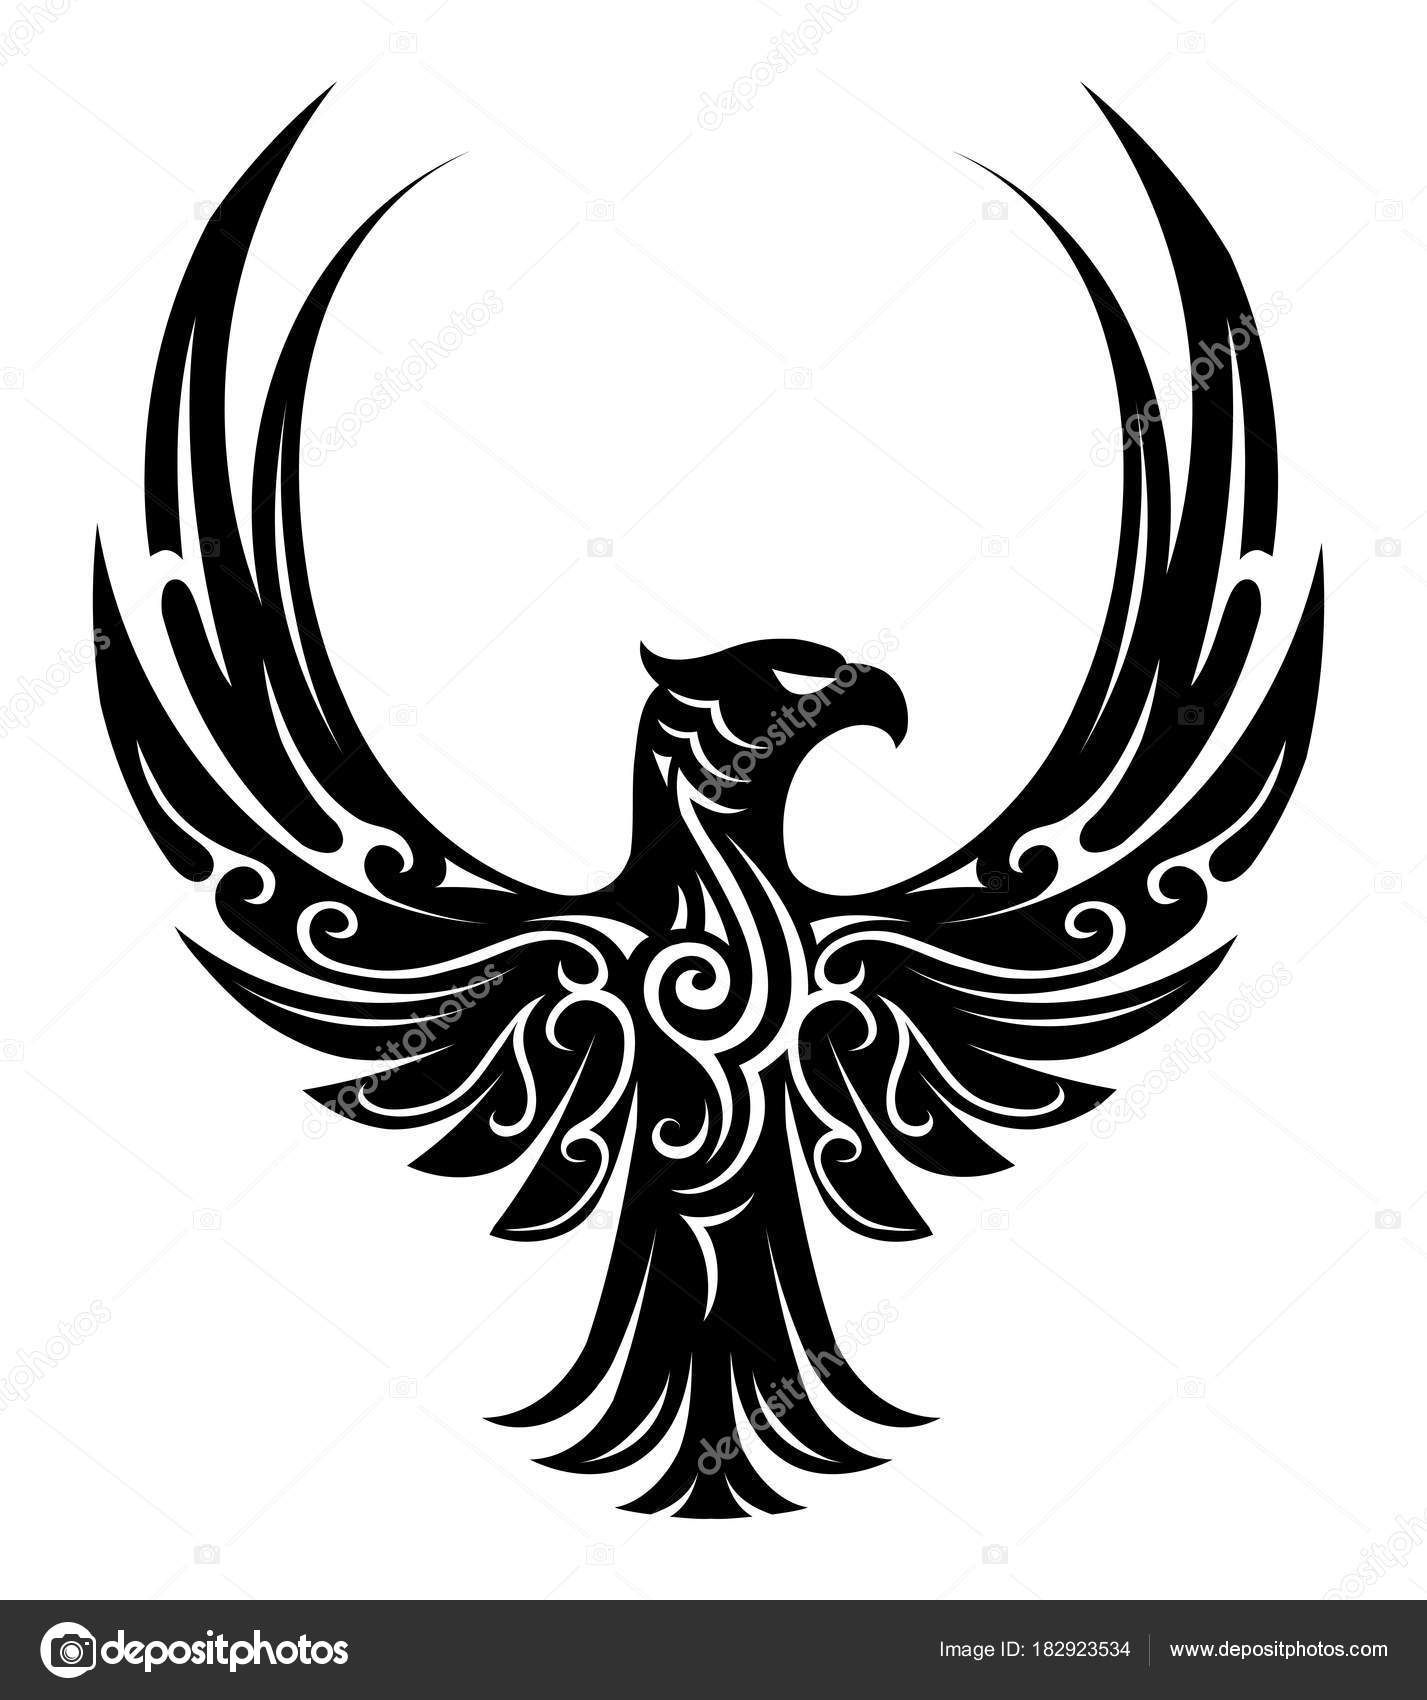 Tatuaje Aguila forma del tatuaje del águila — archivo imágenes vectoriales © akv_lv